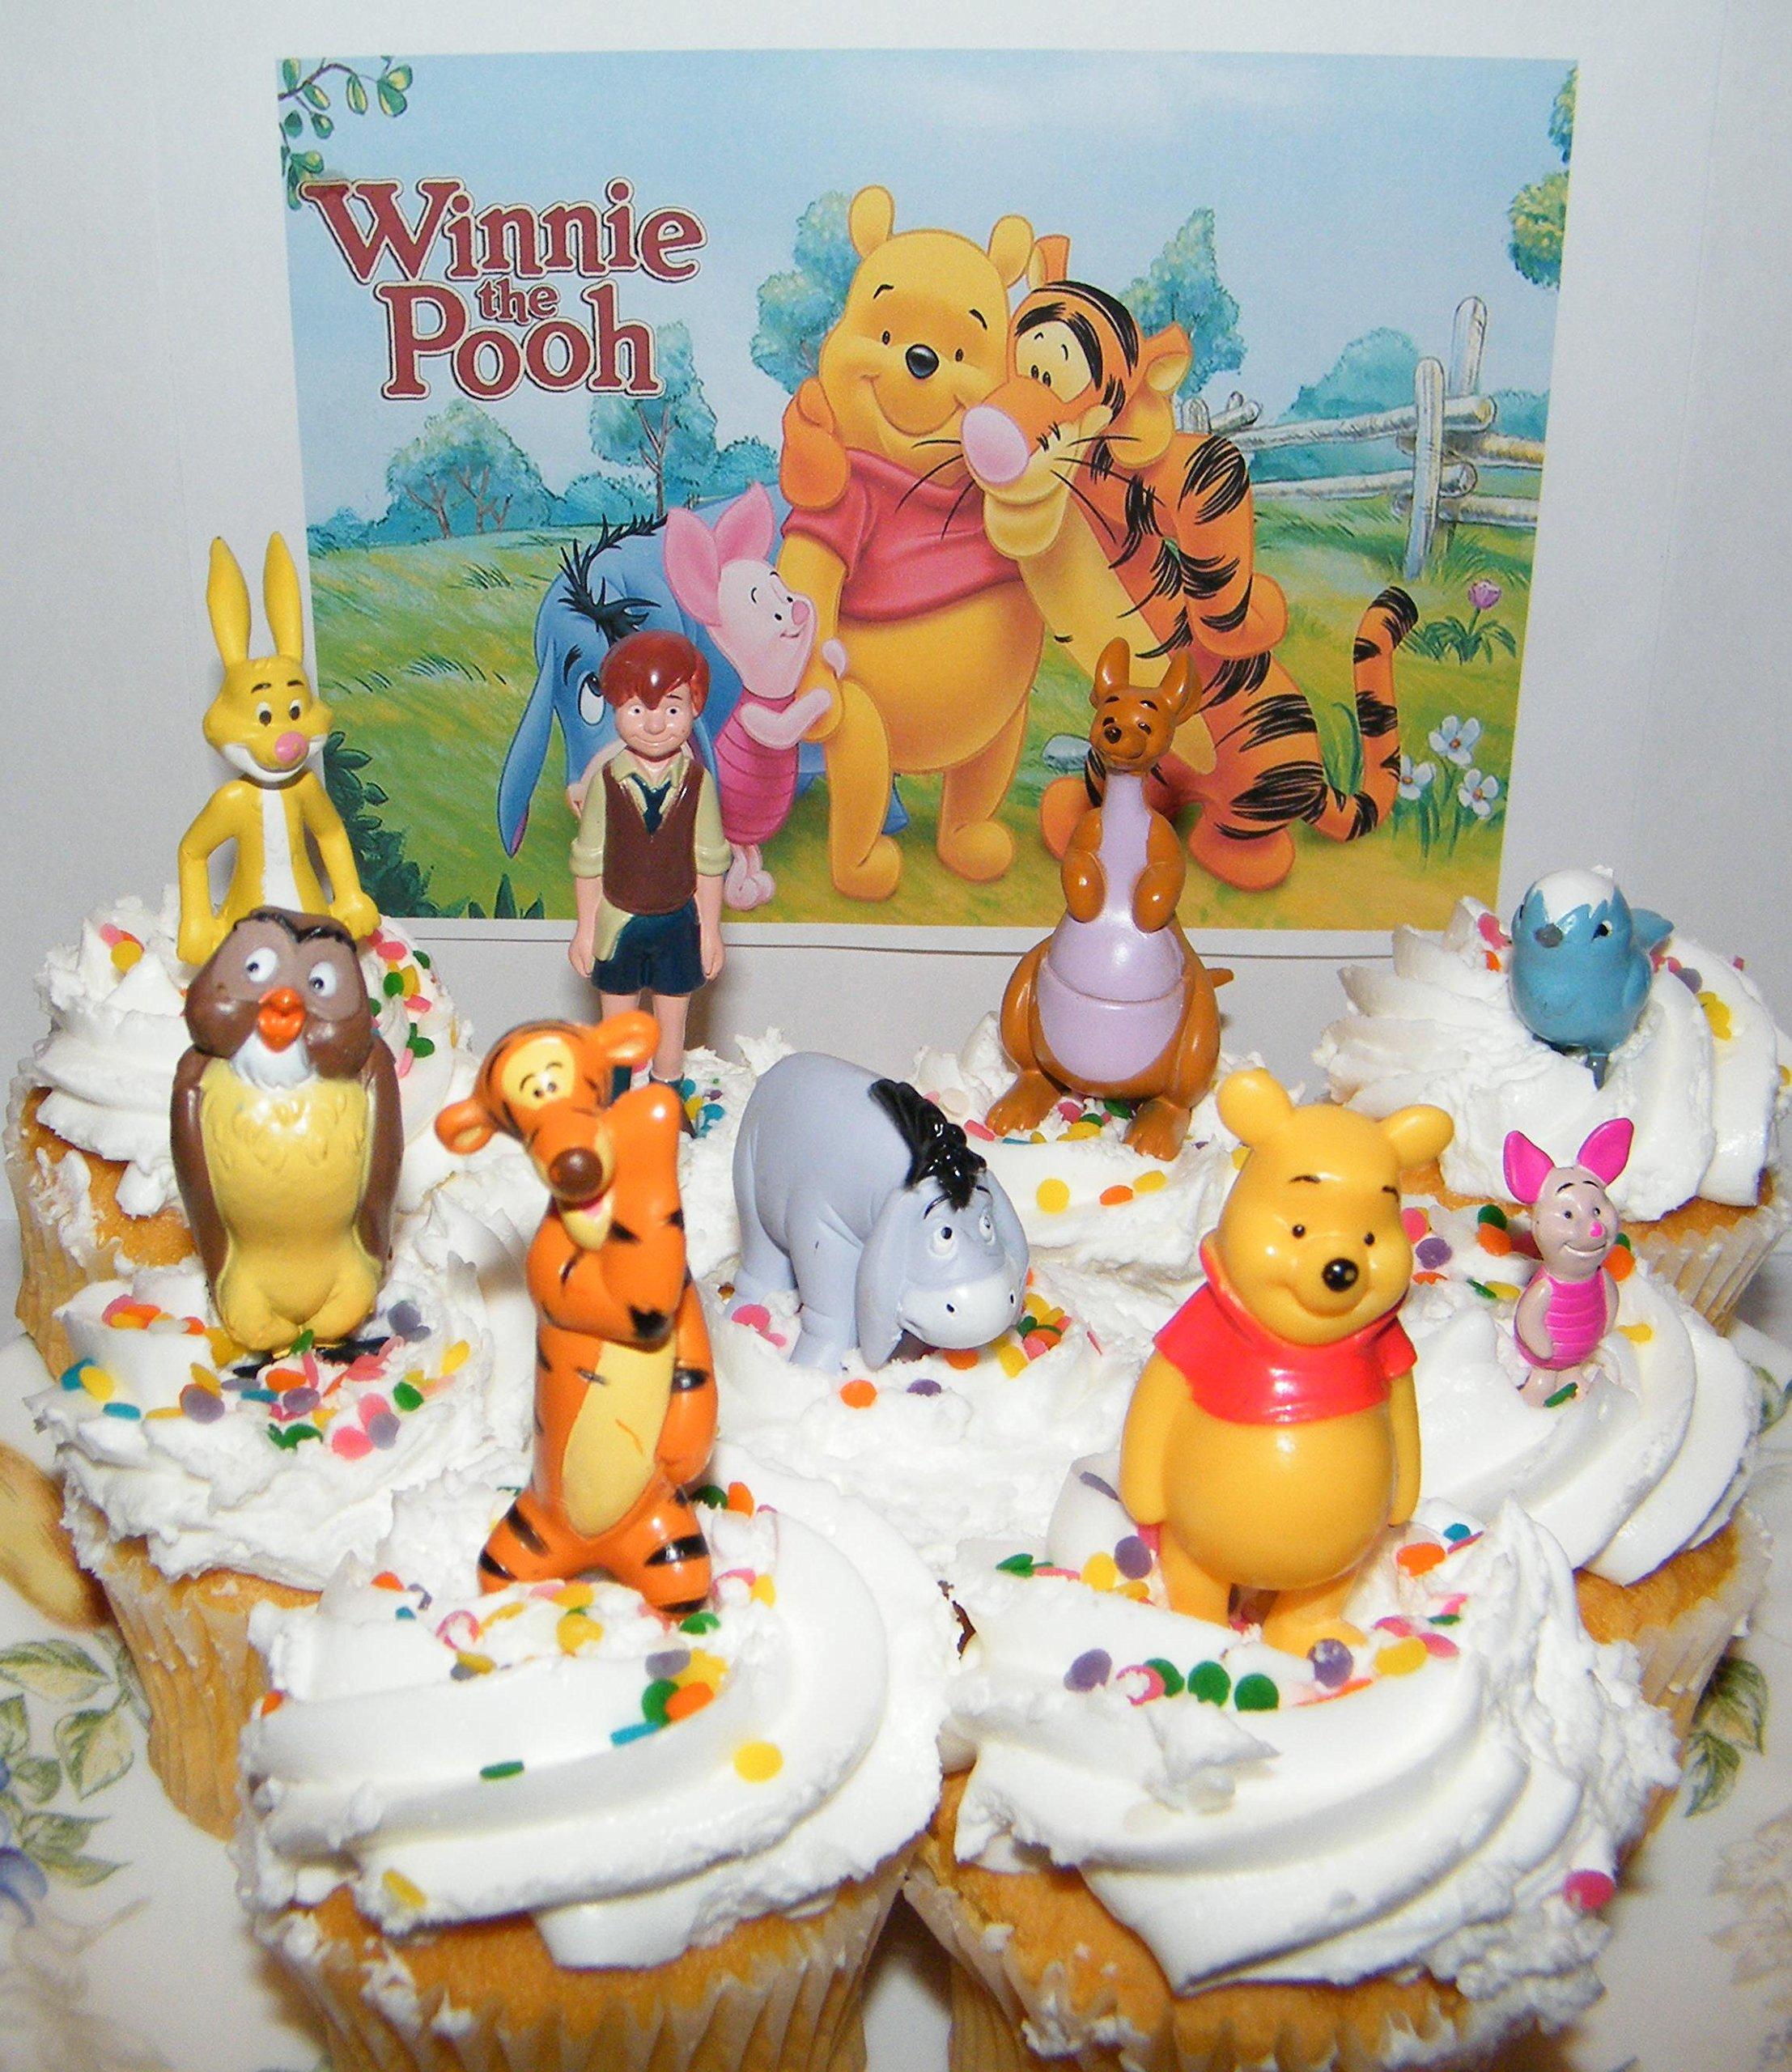 Cheap Winnie The Pooh Cake Pan Find Winnie The Pooh Cake Pan Deals